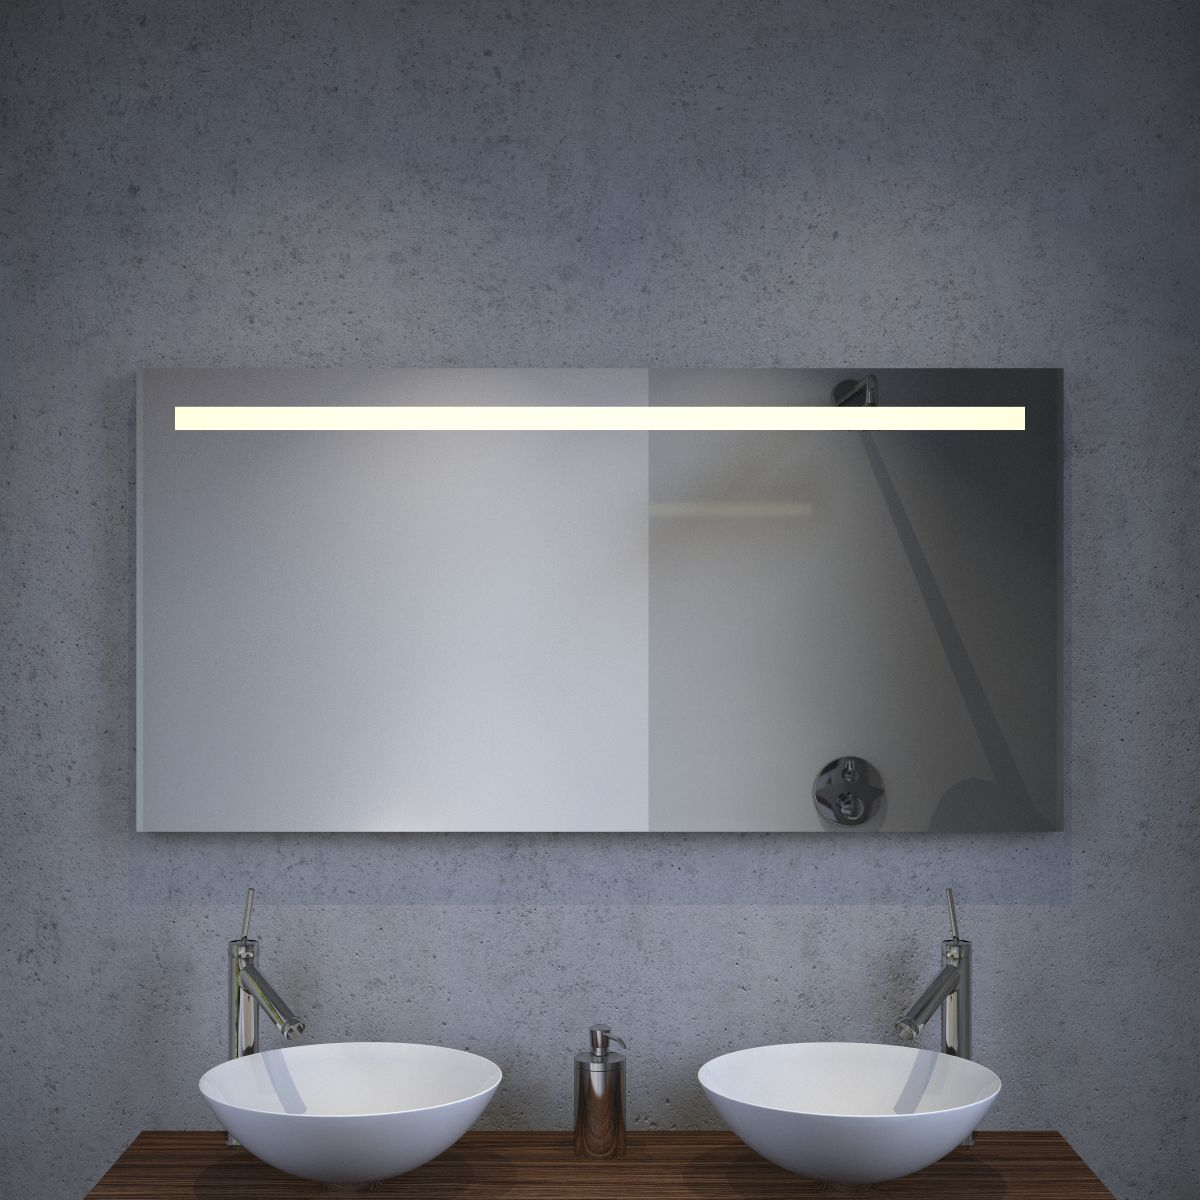 Badkamer LED spiegel met verwarming en sensor 120x60 cm - Designspiegels